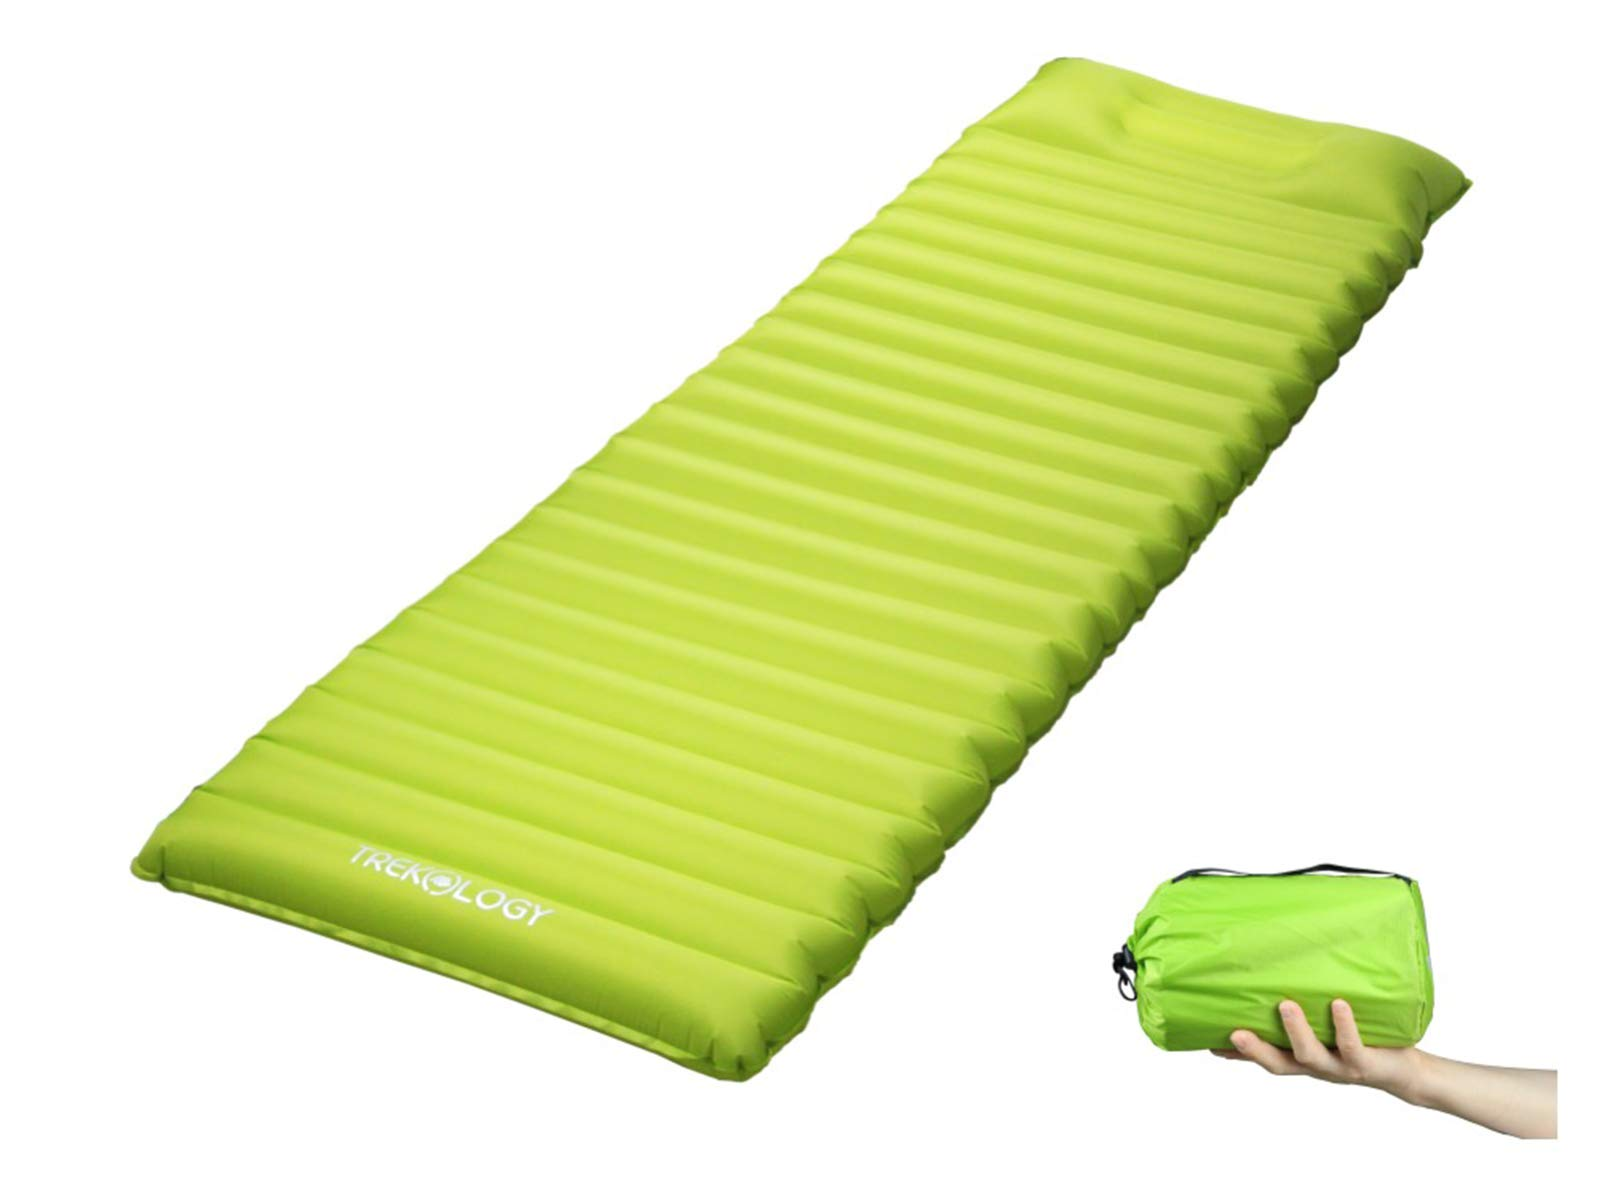 Trekology Ultralight Sleeping Pad, Inflating Camping Mattress w/Air Pump Dry Sack Bag - Compact Lightweight Camp Mat, Inflatable Backpacking Gear as Tent Pads (Green with Built-in Pillow) by Trekology